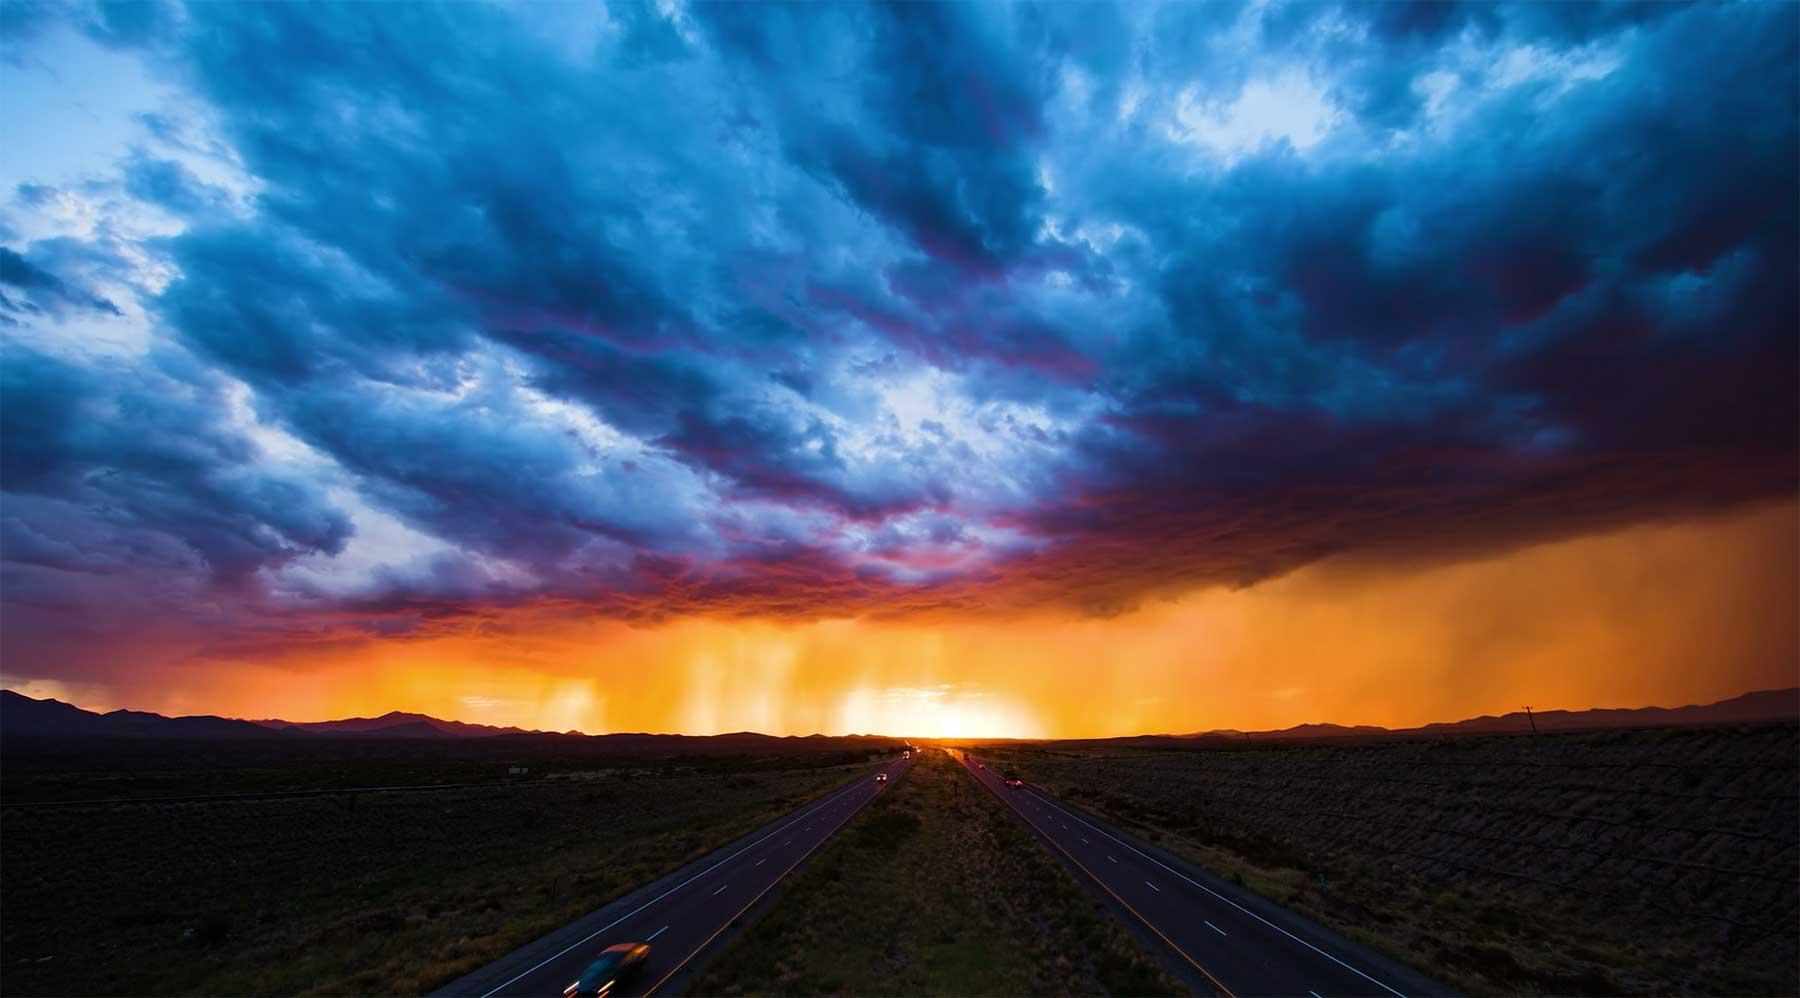 Schöner Stürmen: Monsoon IV